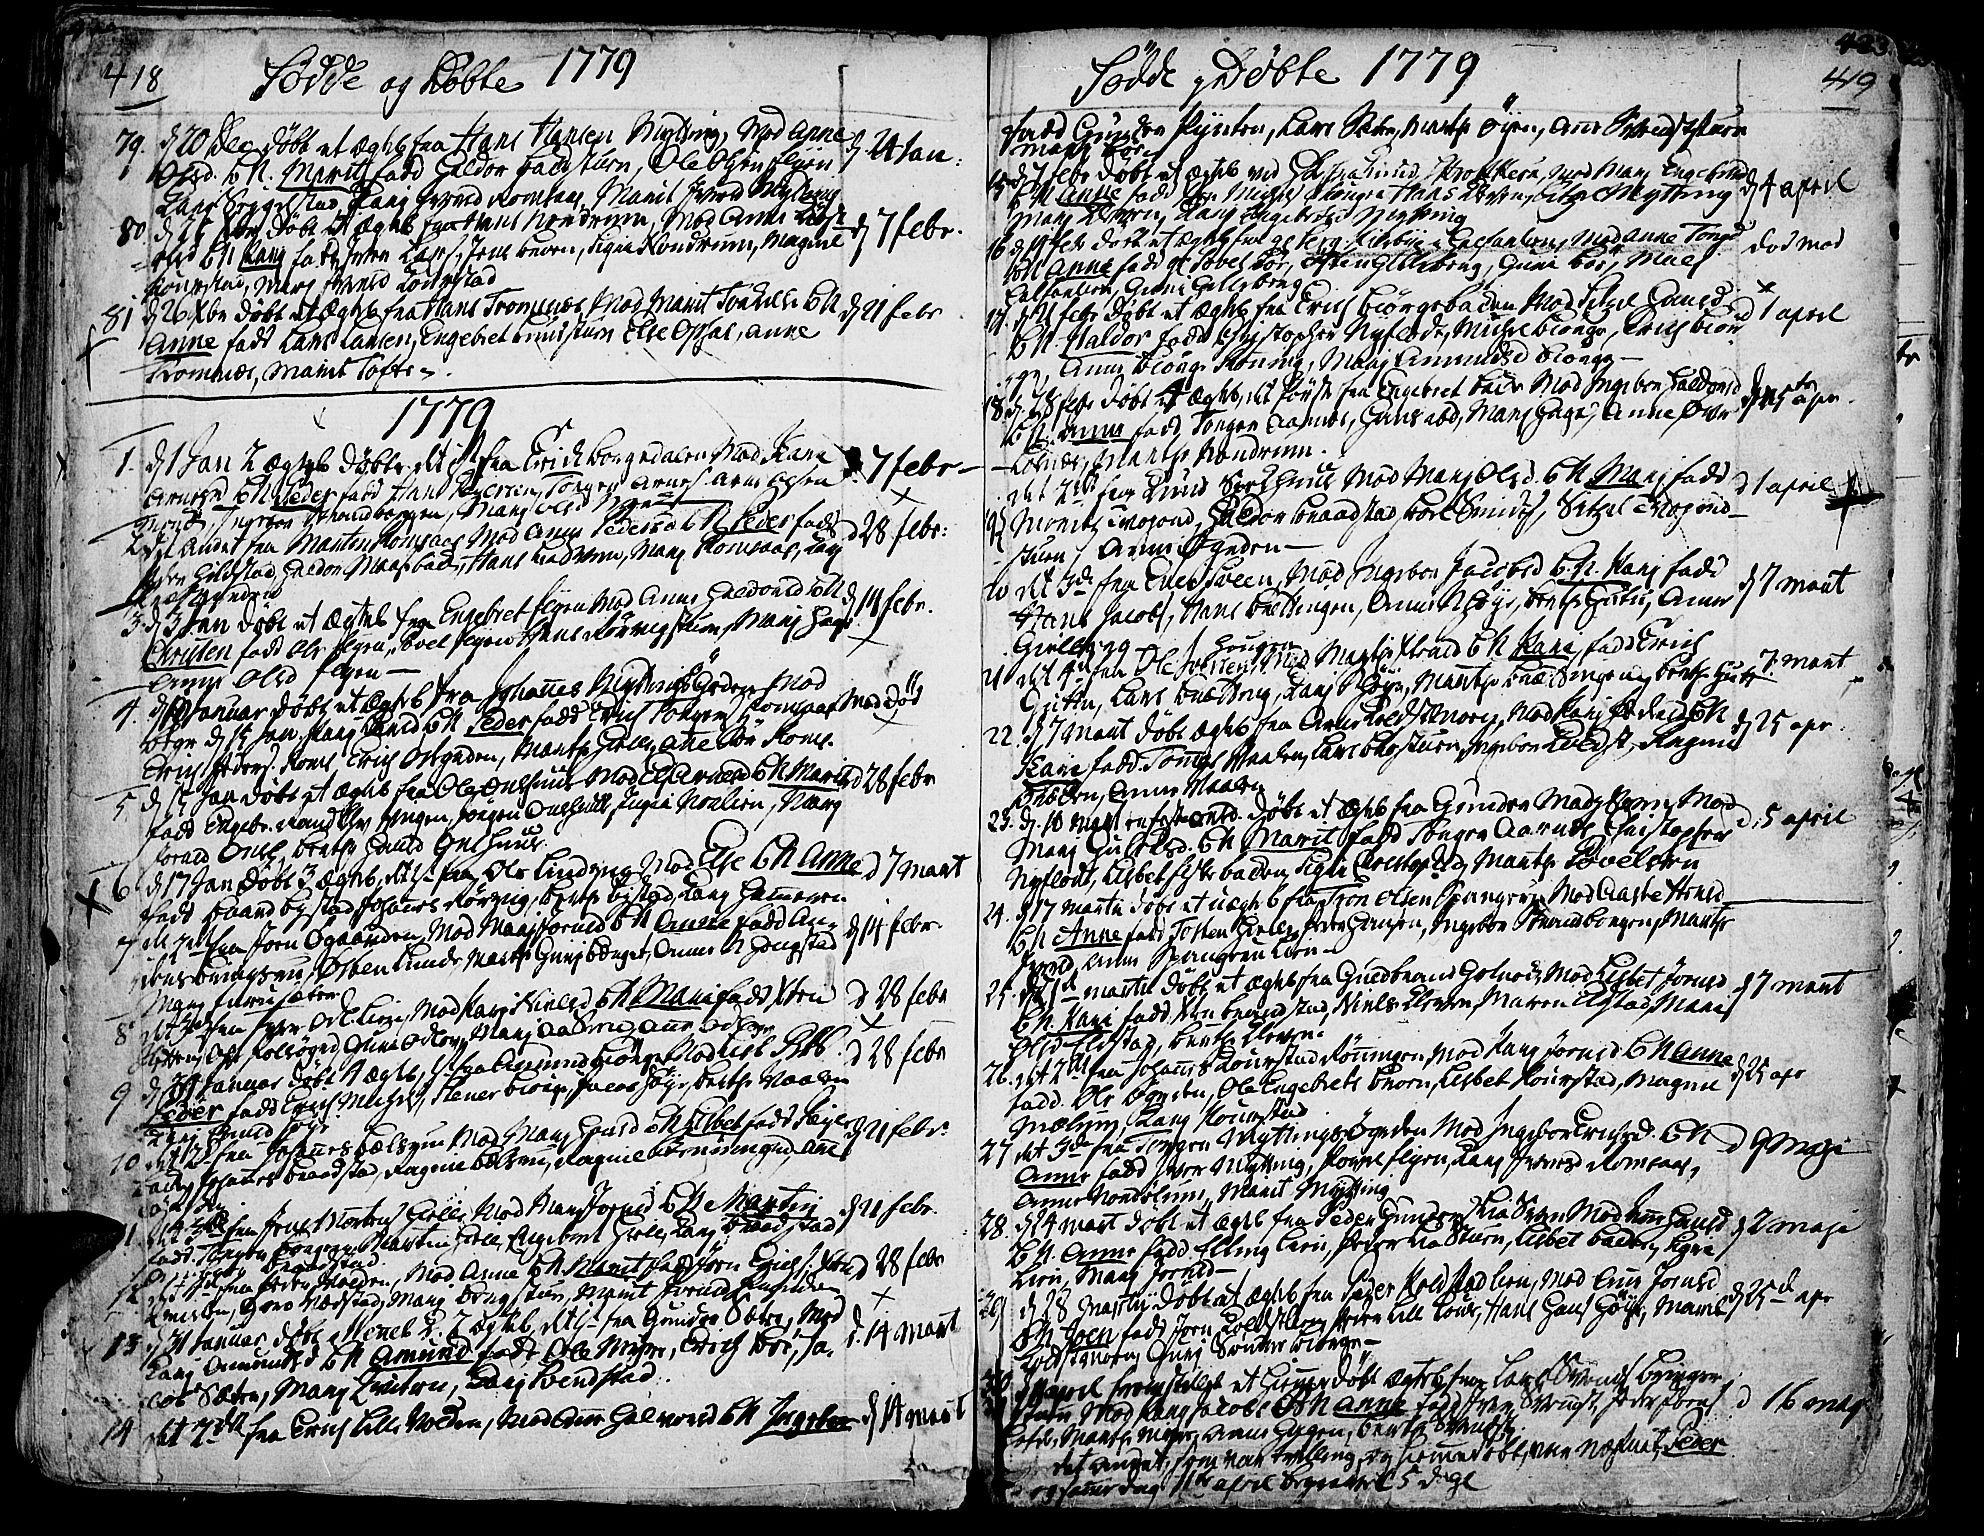 SAH, Ringebu prestekontor, Ministerialbok nr. 2, 1734-1780, s. 418-419